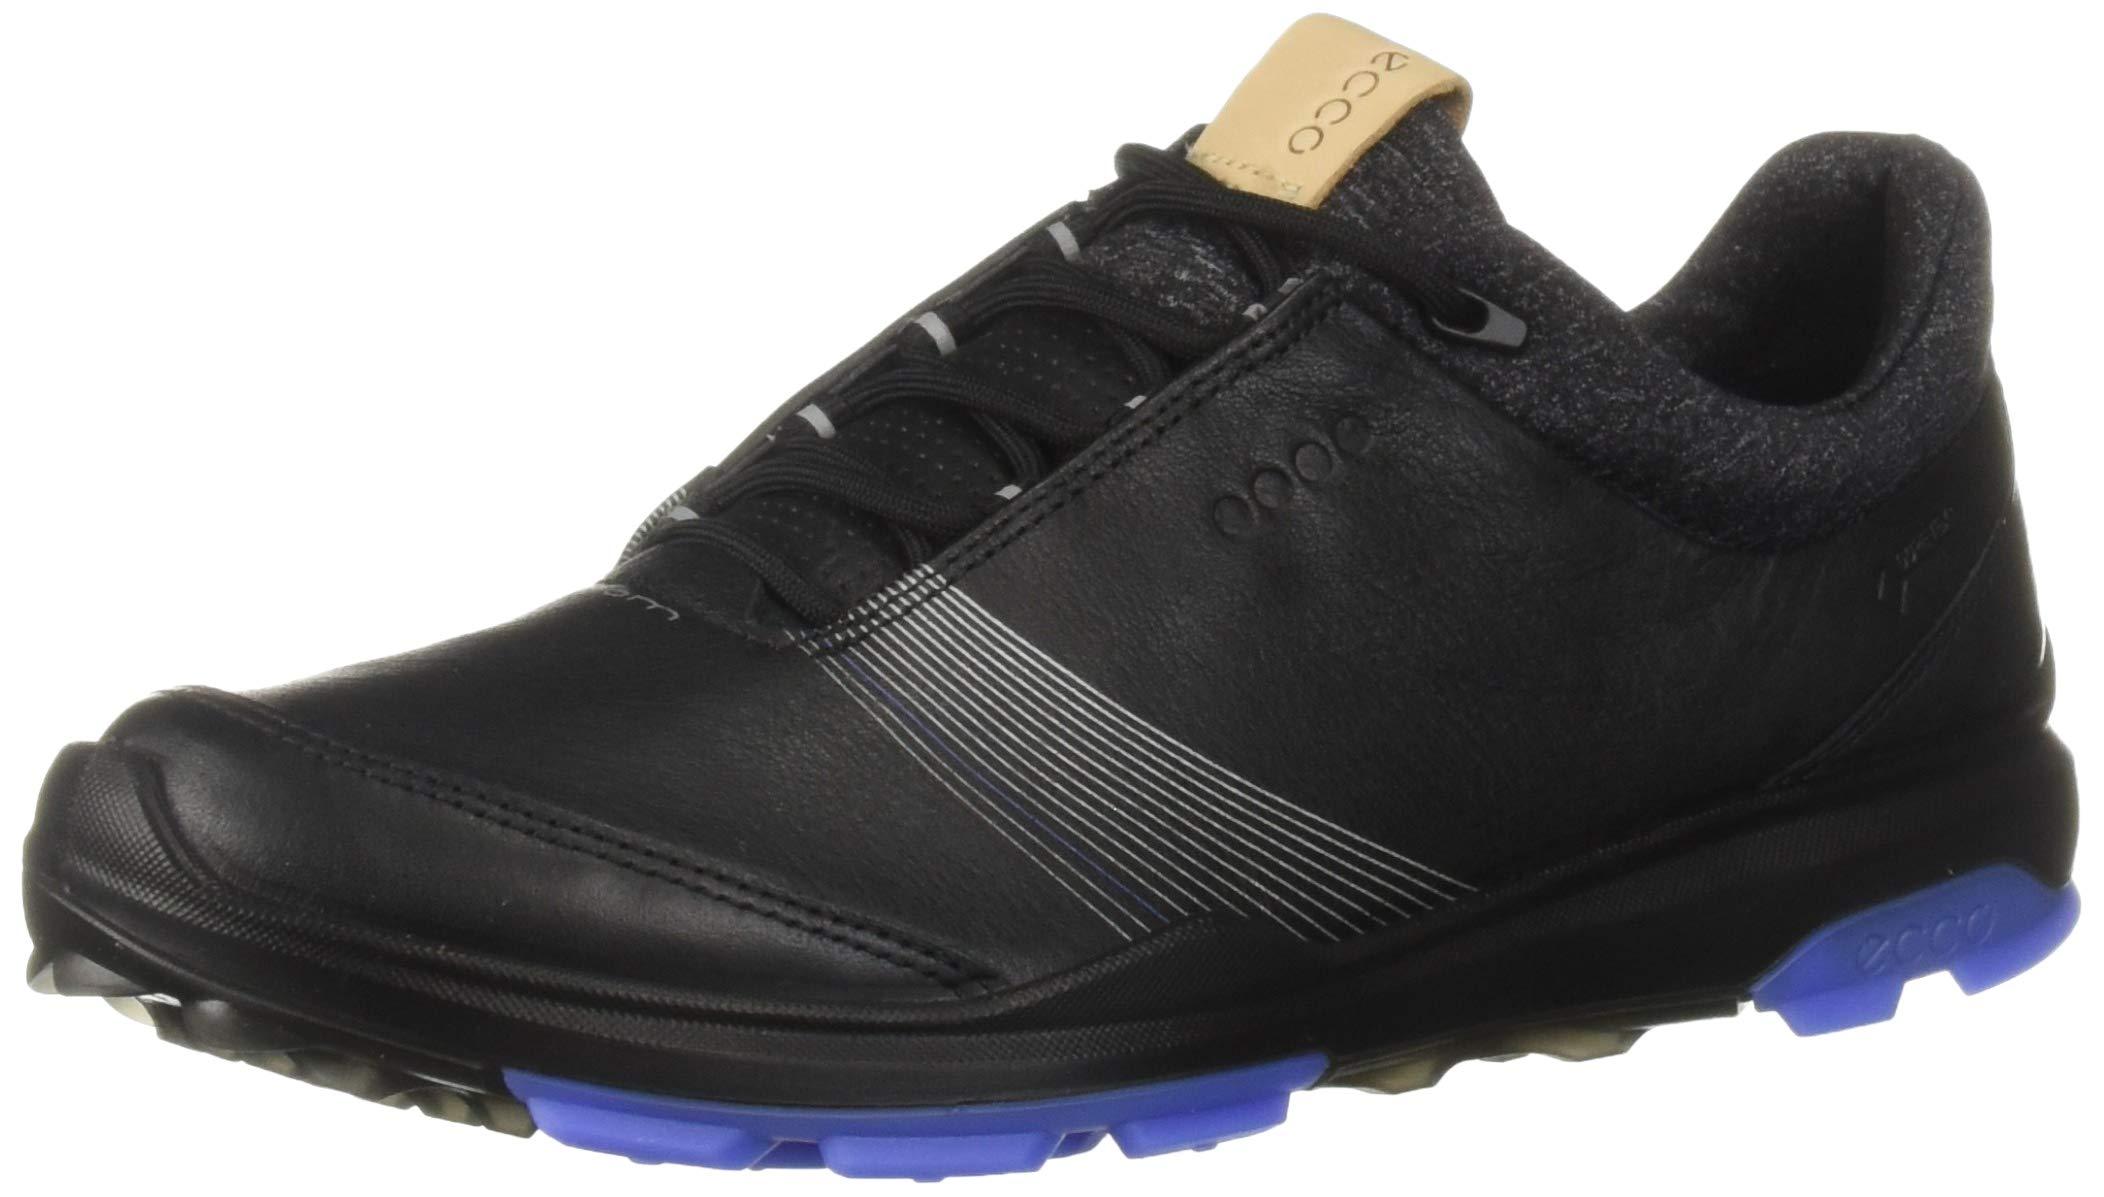 ECCO Women's Biom Hybrid 3 Gore-TEX Golf Shoe, Black, 35 M EU (4-4.5 US)